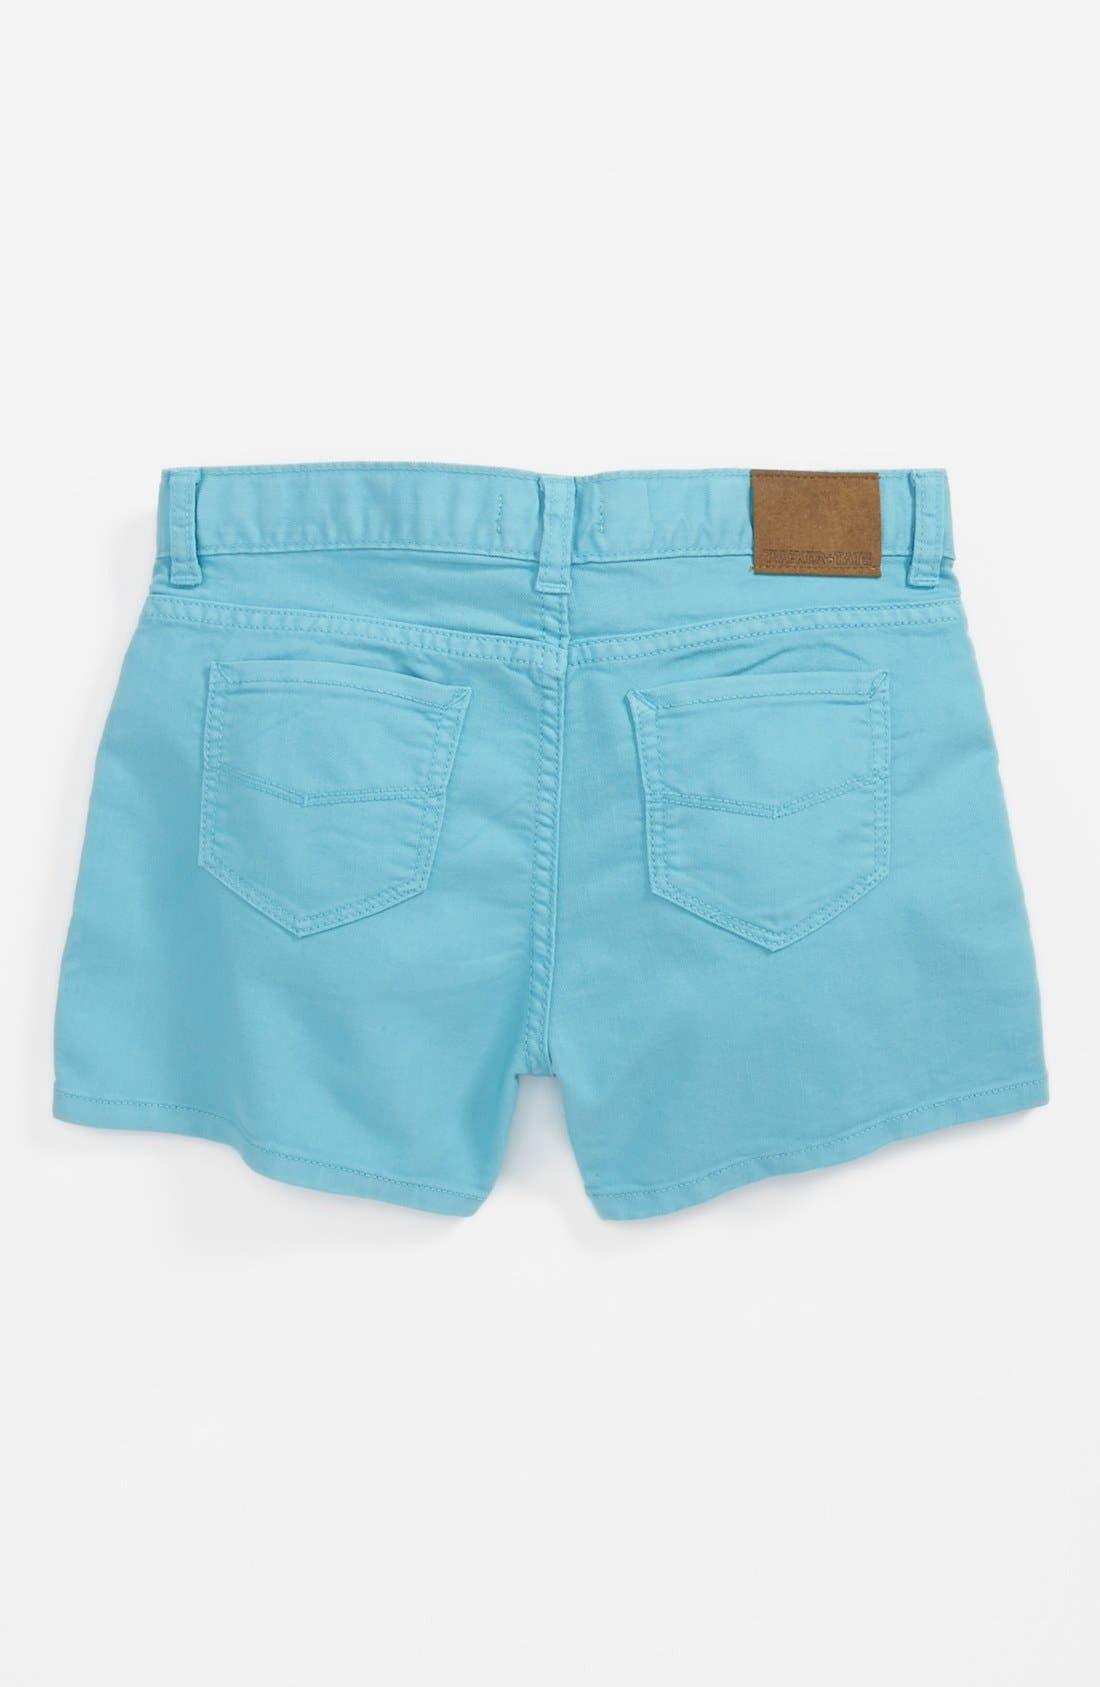 Main Image - Tucker + Tate 'Abbie' Denim Shorts (Big Girls)